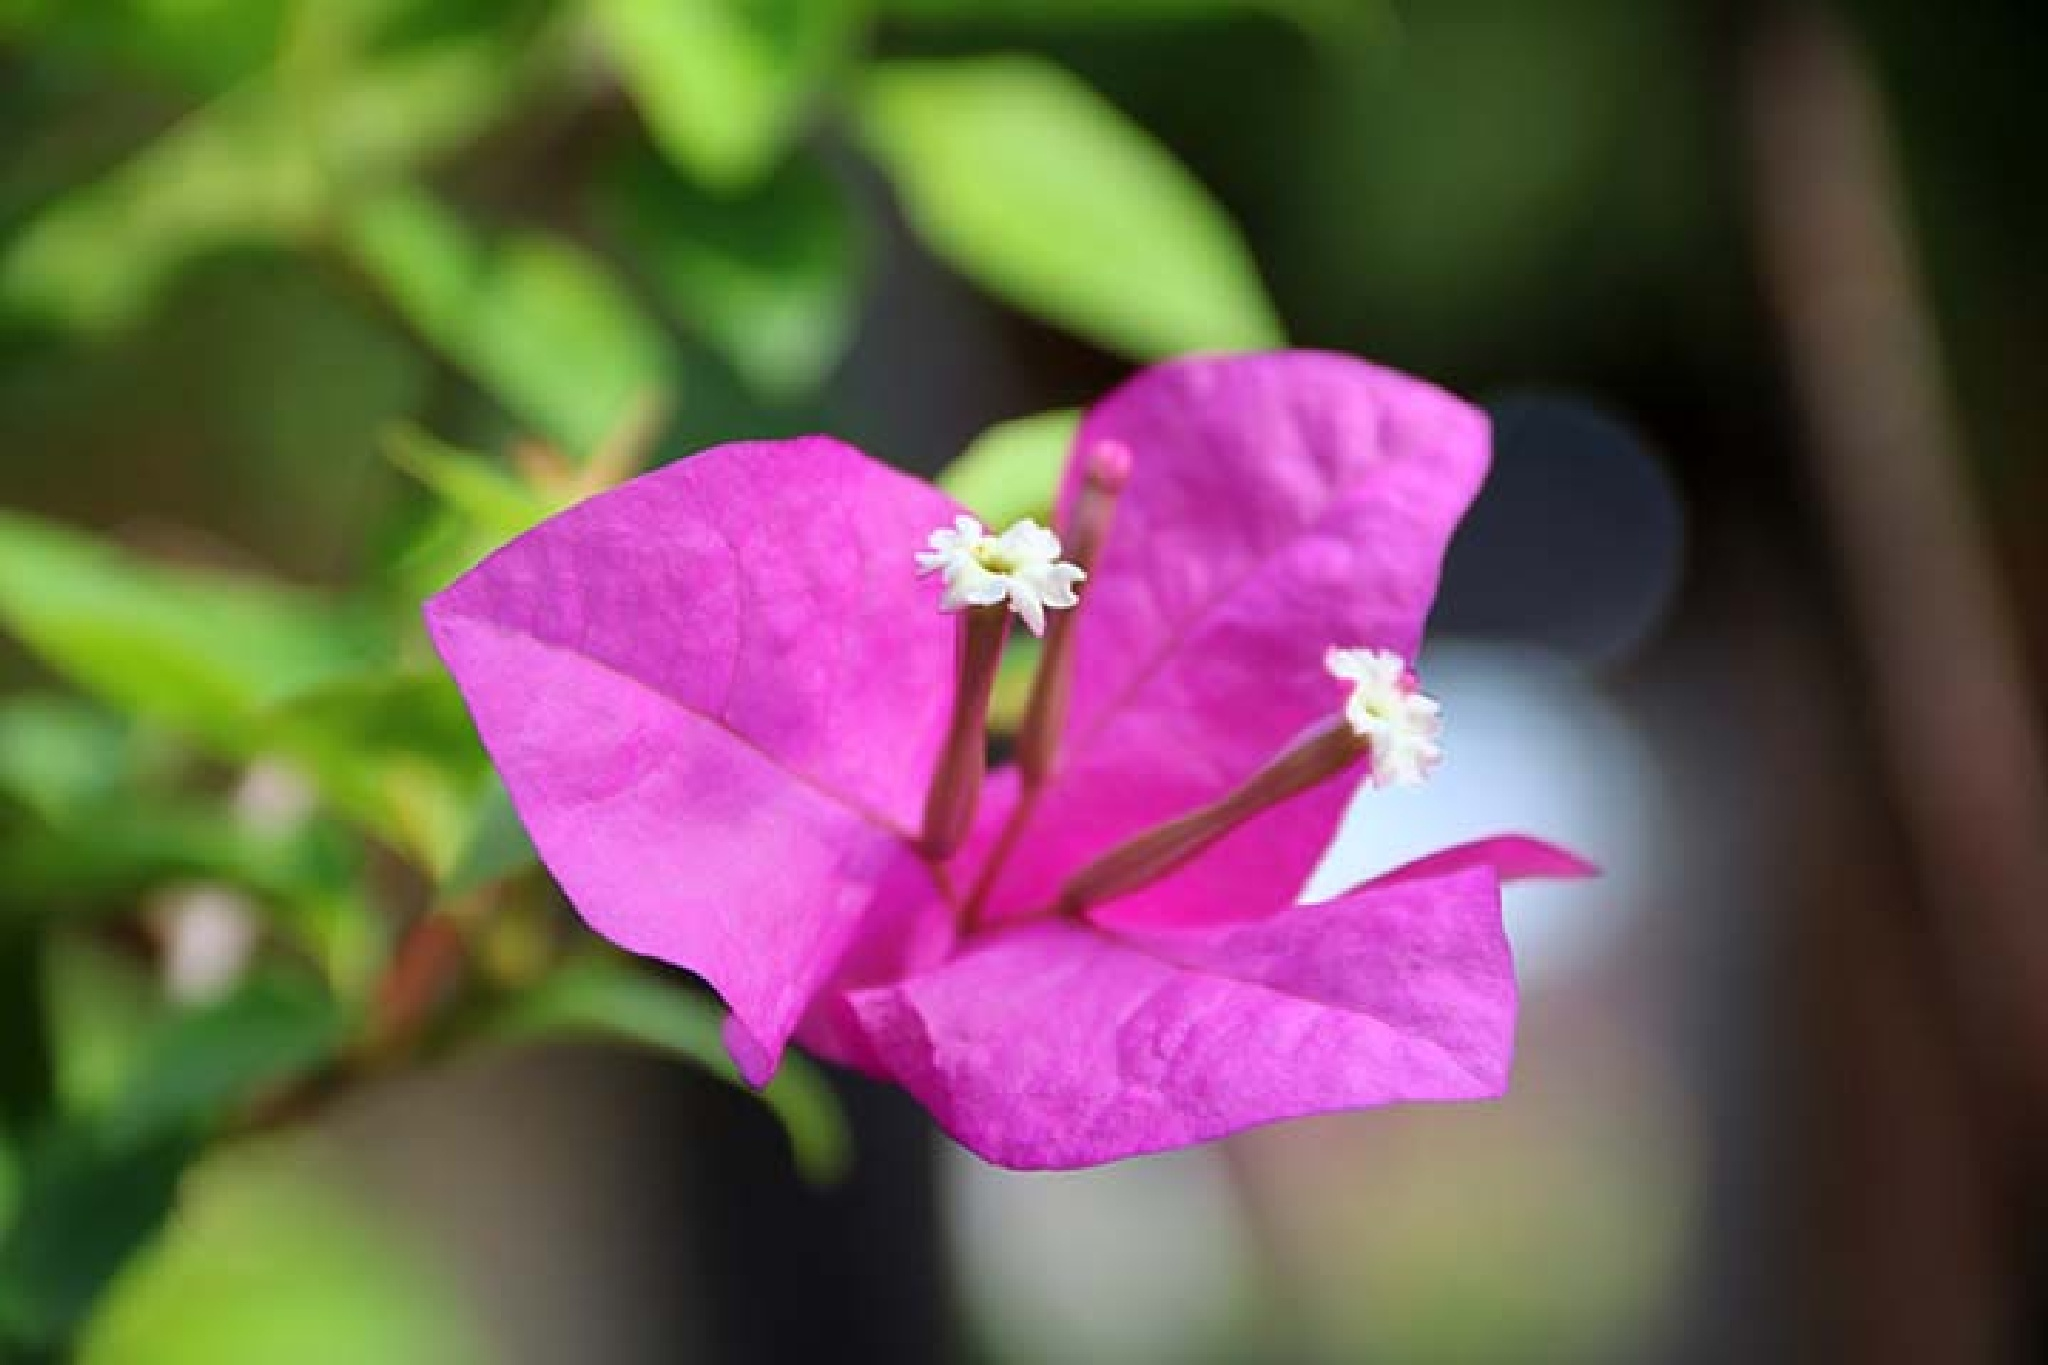 bunga kembang kertas by I Ketut Sukiana